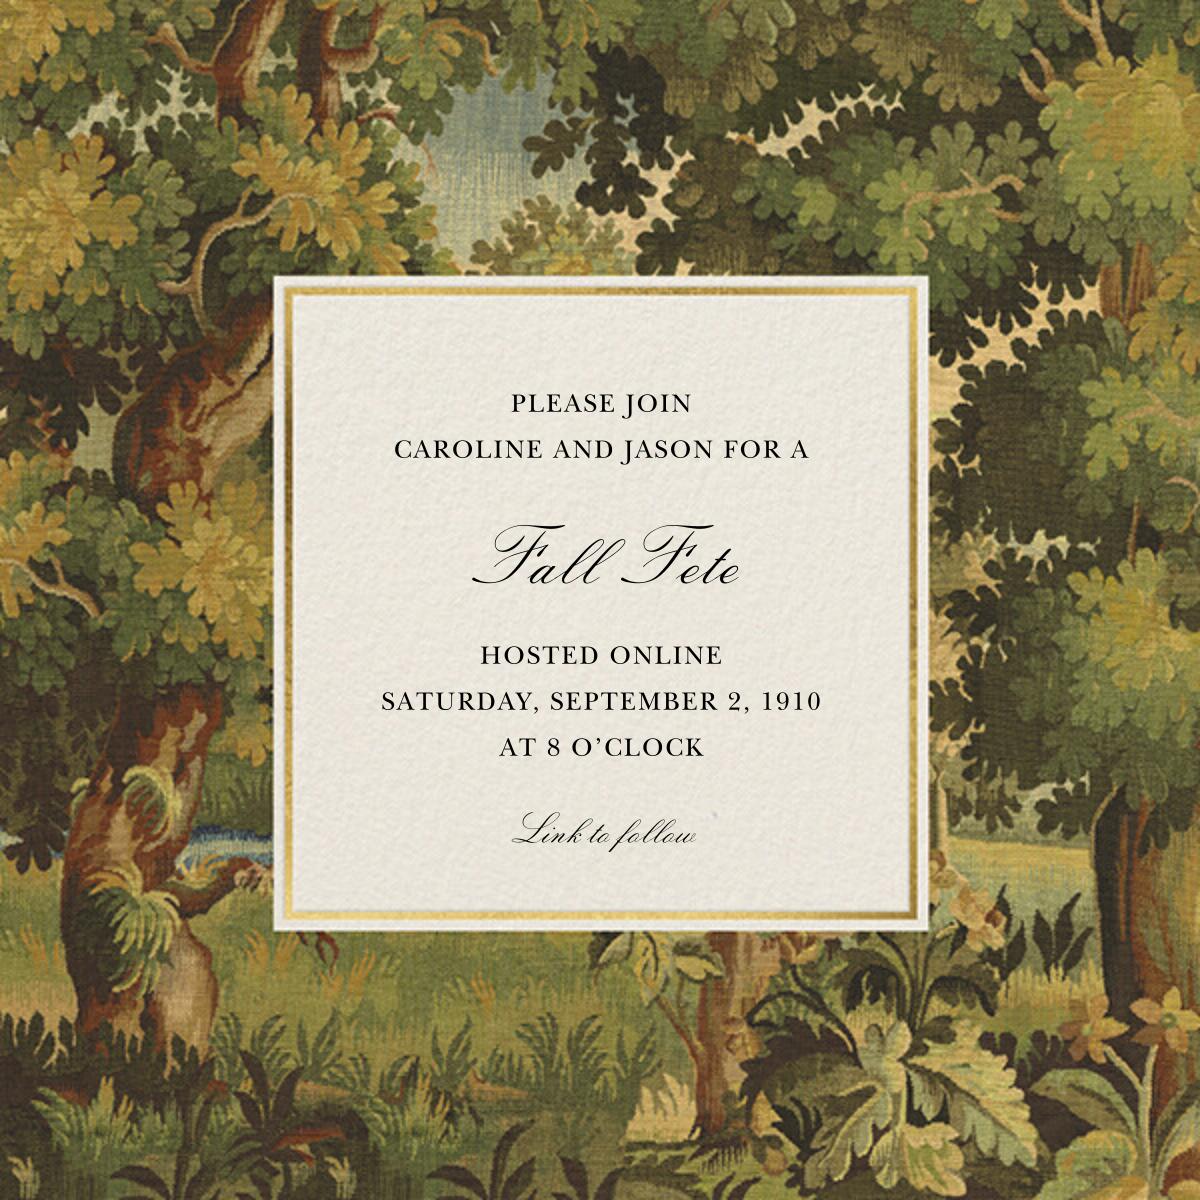 Woodland - Oscar de la Renta - Fall parties